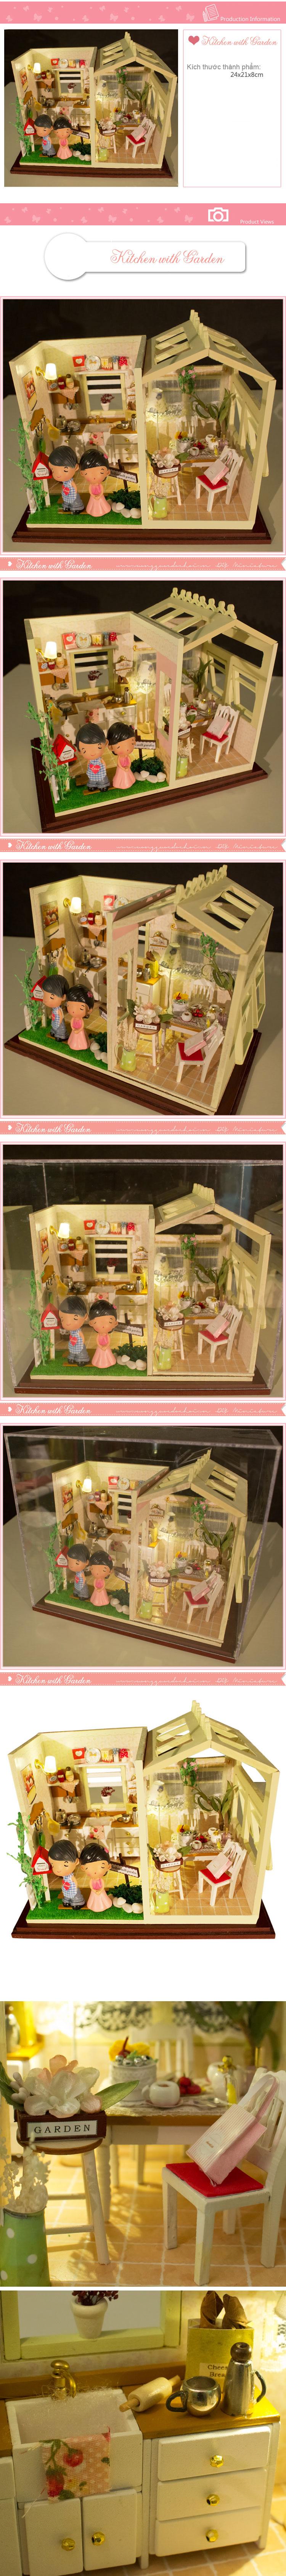 diy miniaturehouse cosyhomec